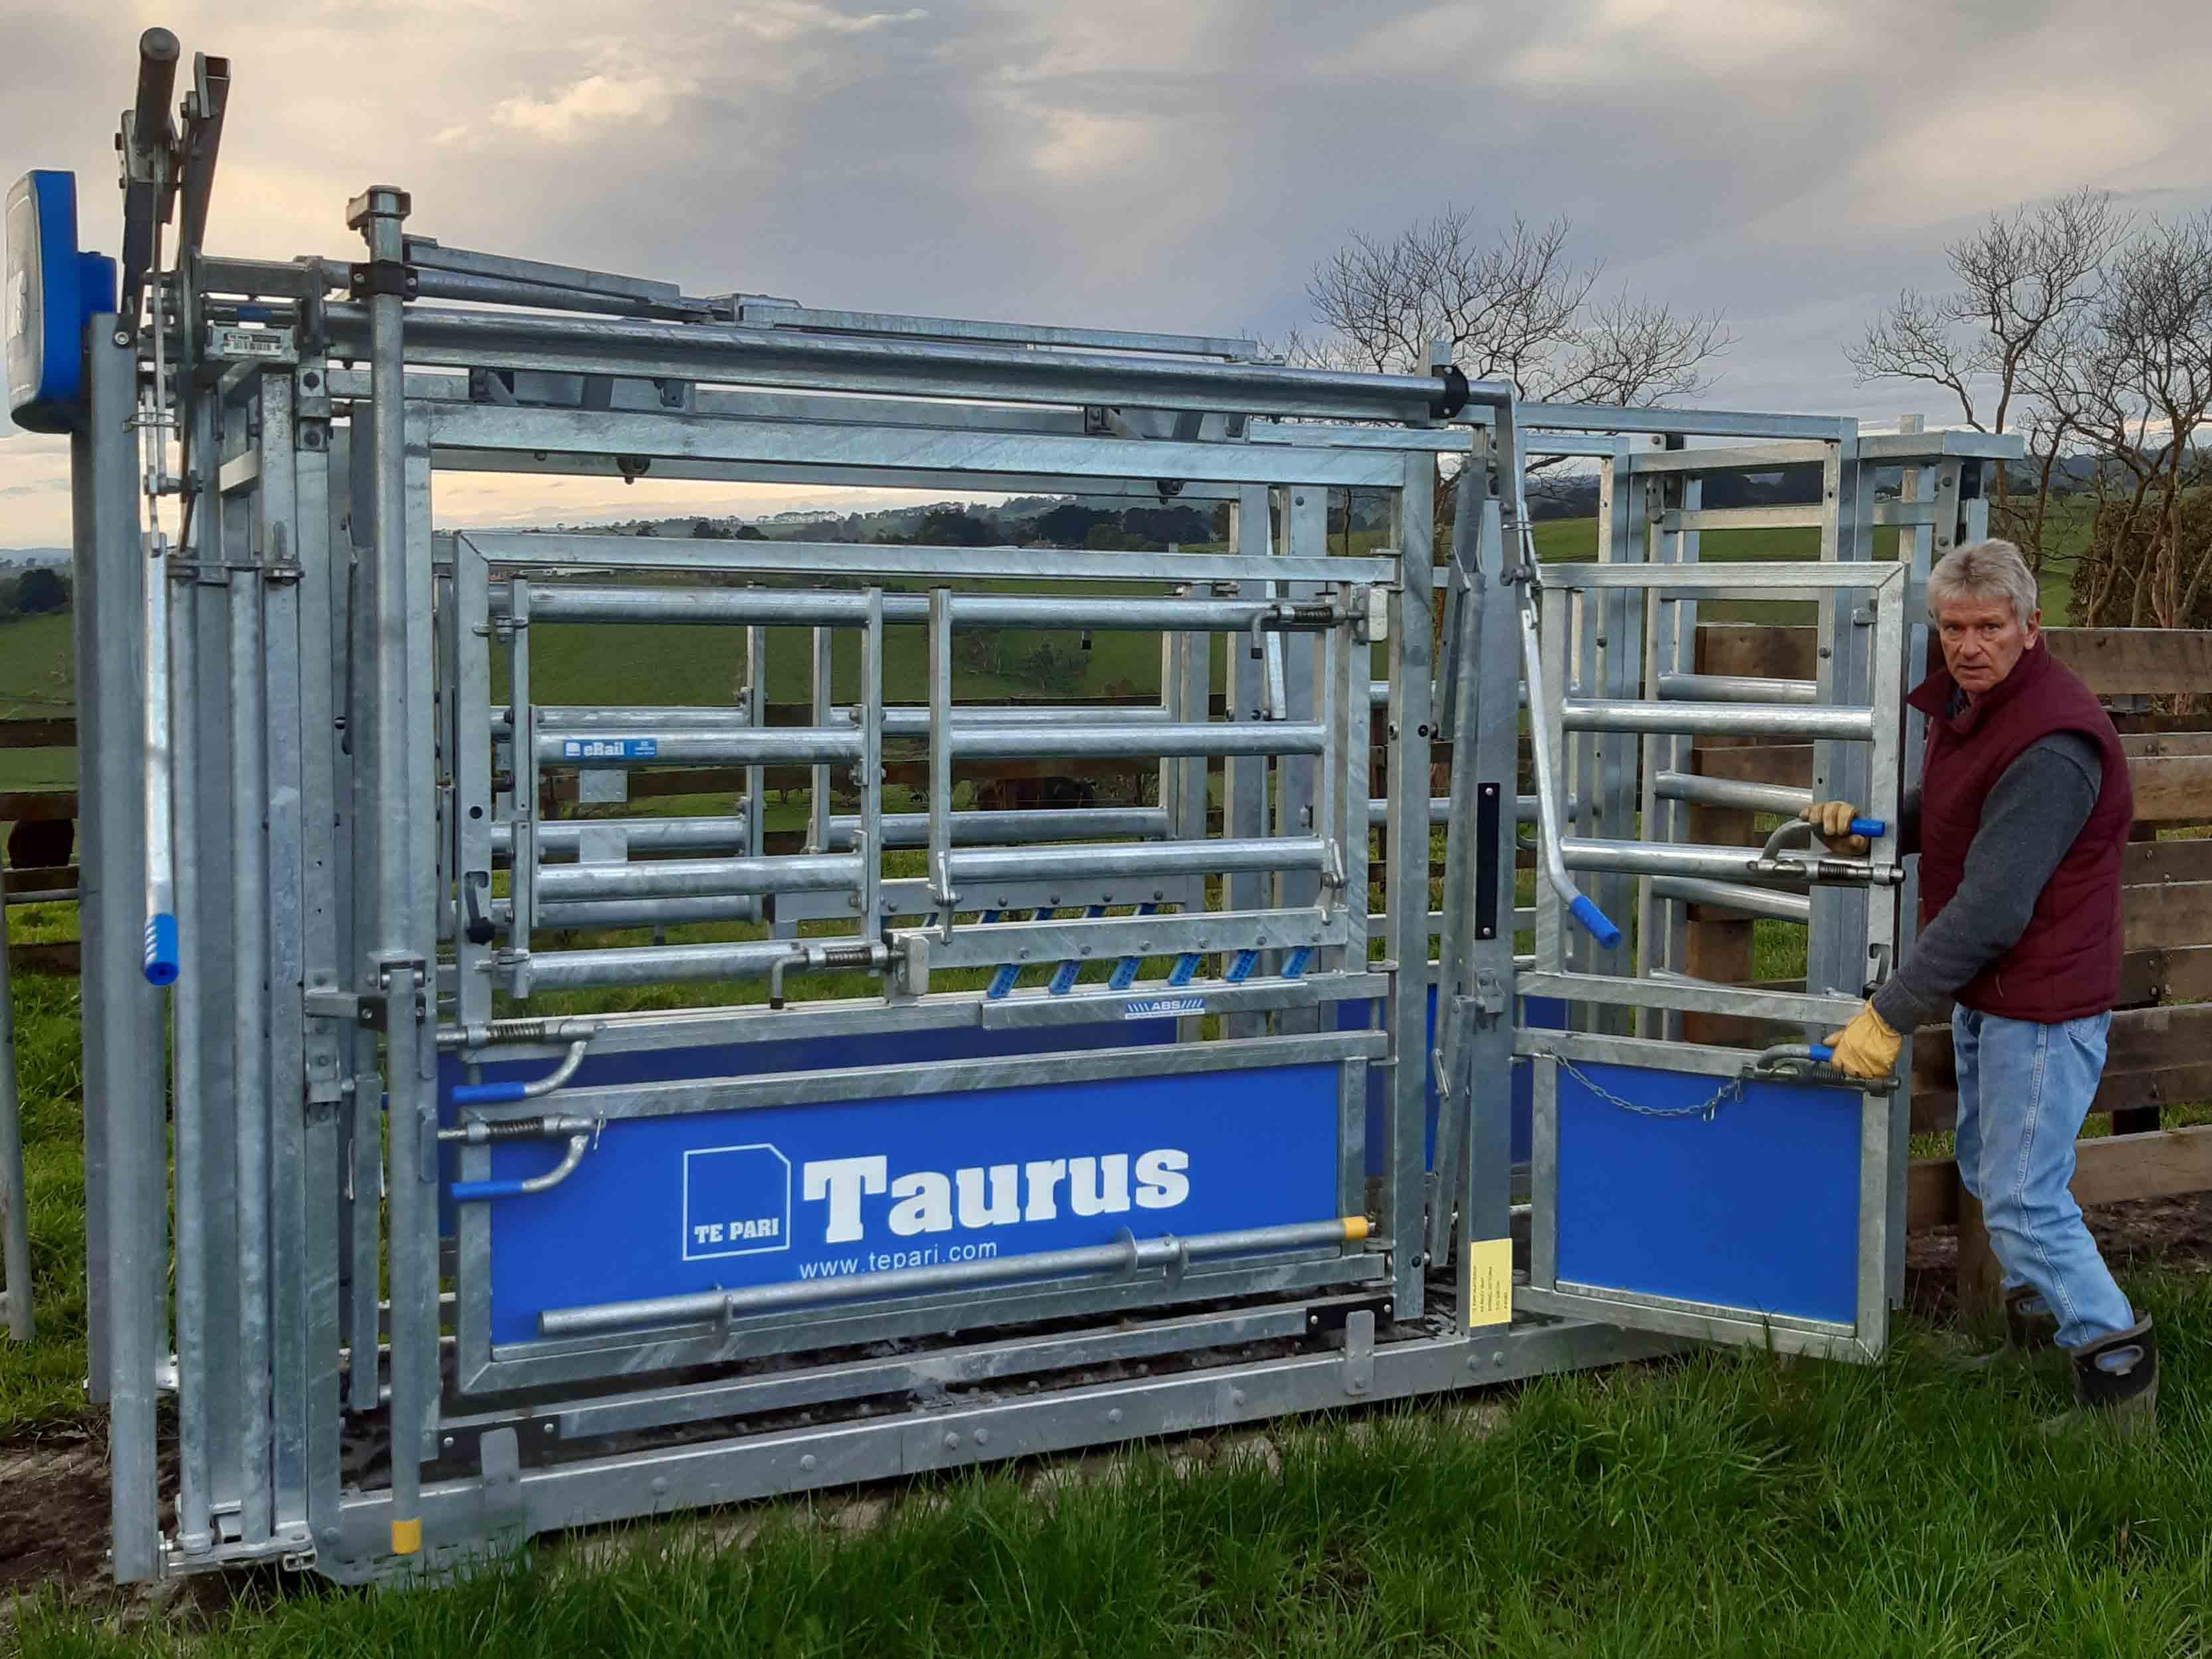 bruce clark with his taurus cattle crush by te pari australia showing side gates